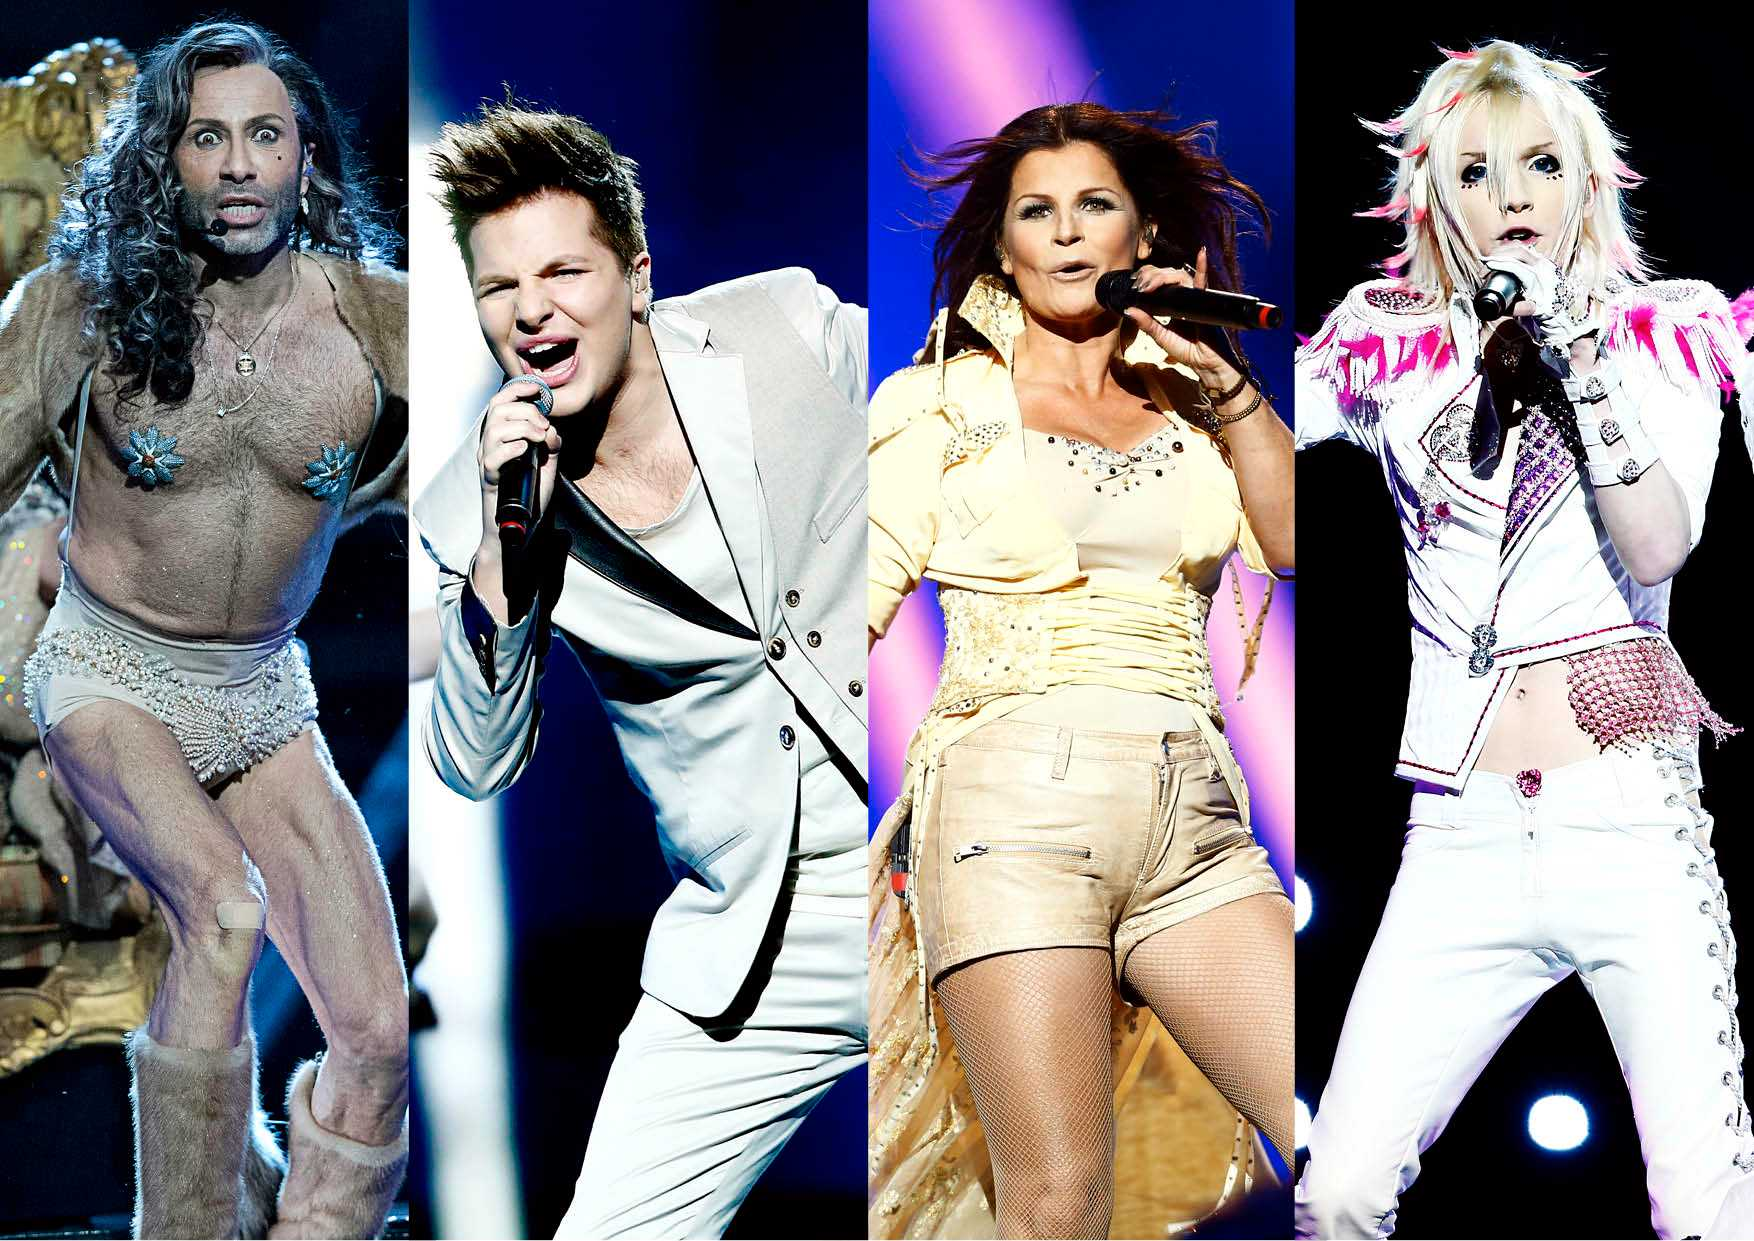 Army of Lovers, Robin Stjernberg, Carola, Yohio. Foto: Magnus Sandberg